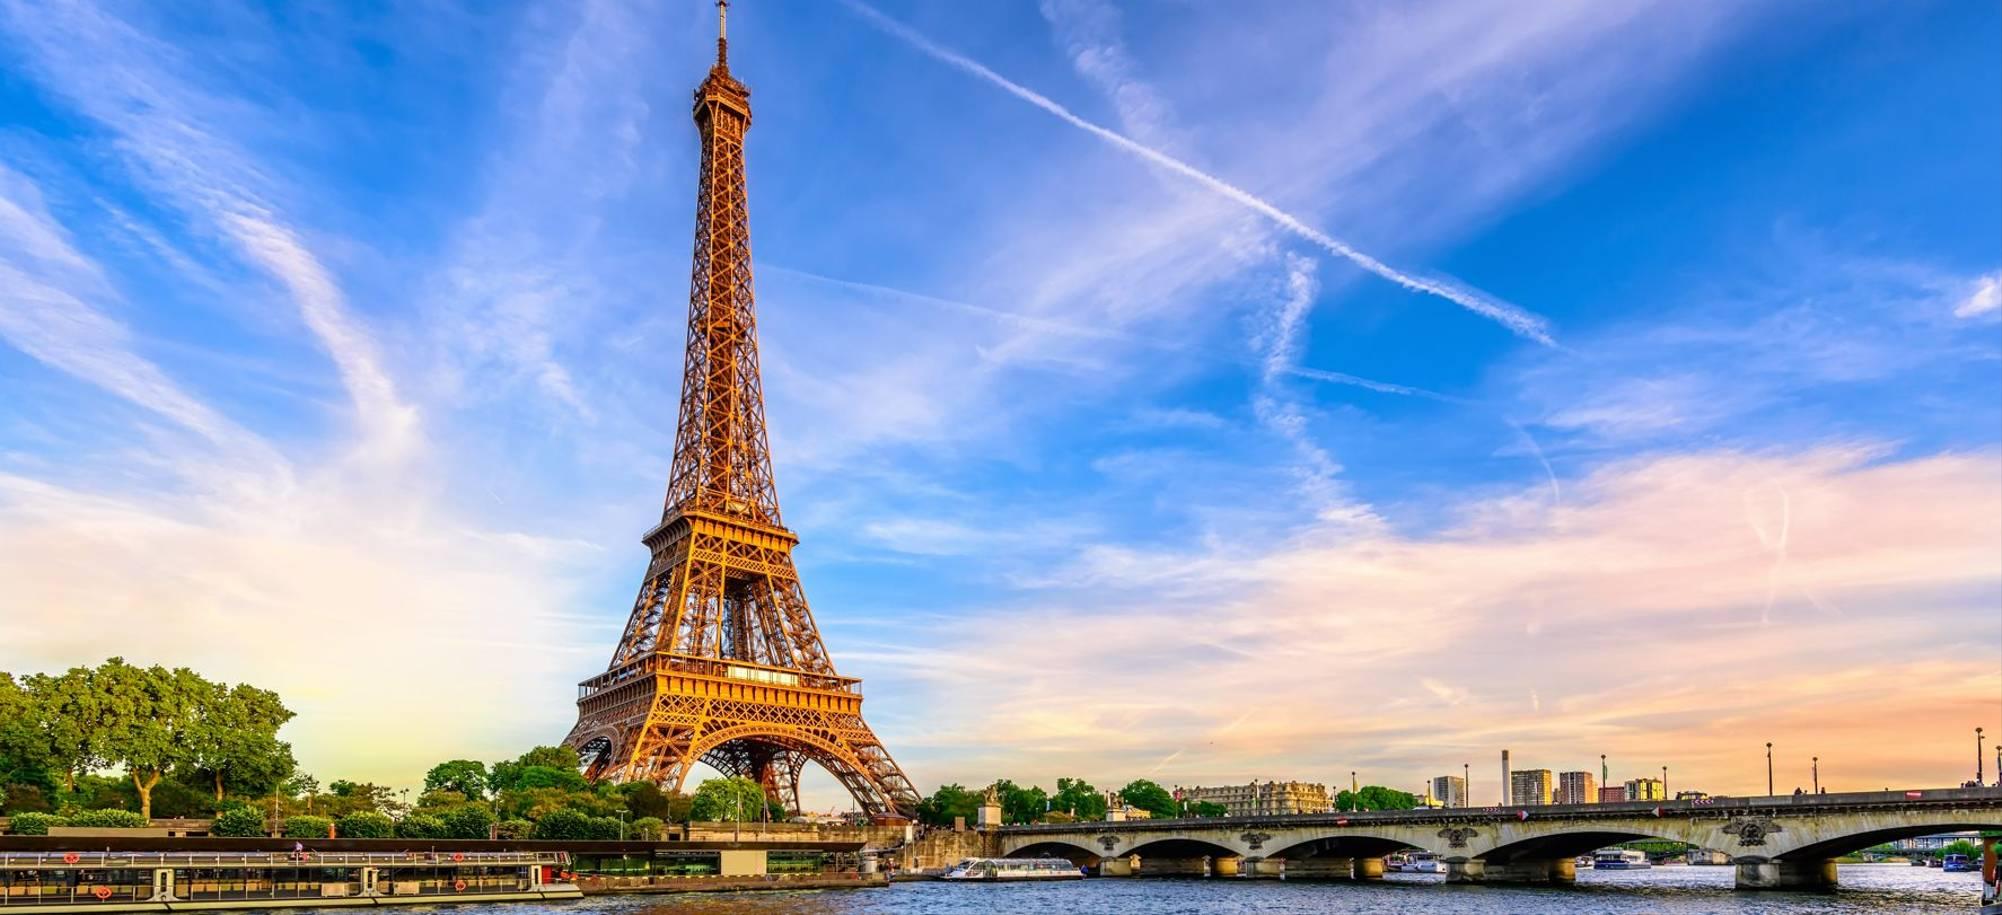 Le Havre   Eiffel Tower, Paris   Itinerary Desktop